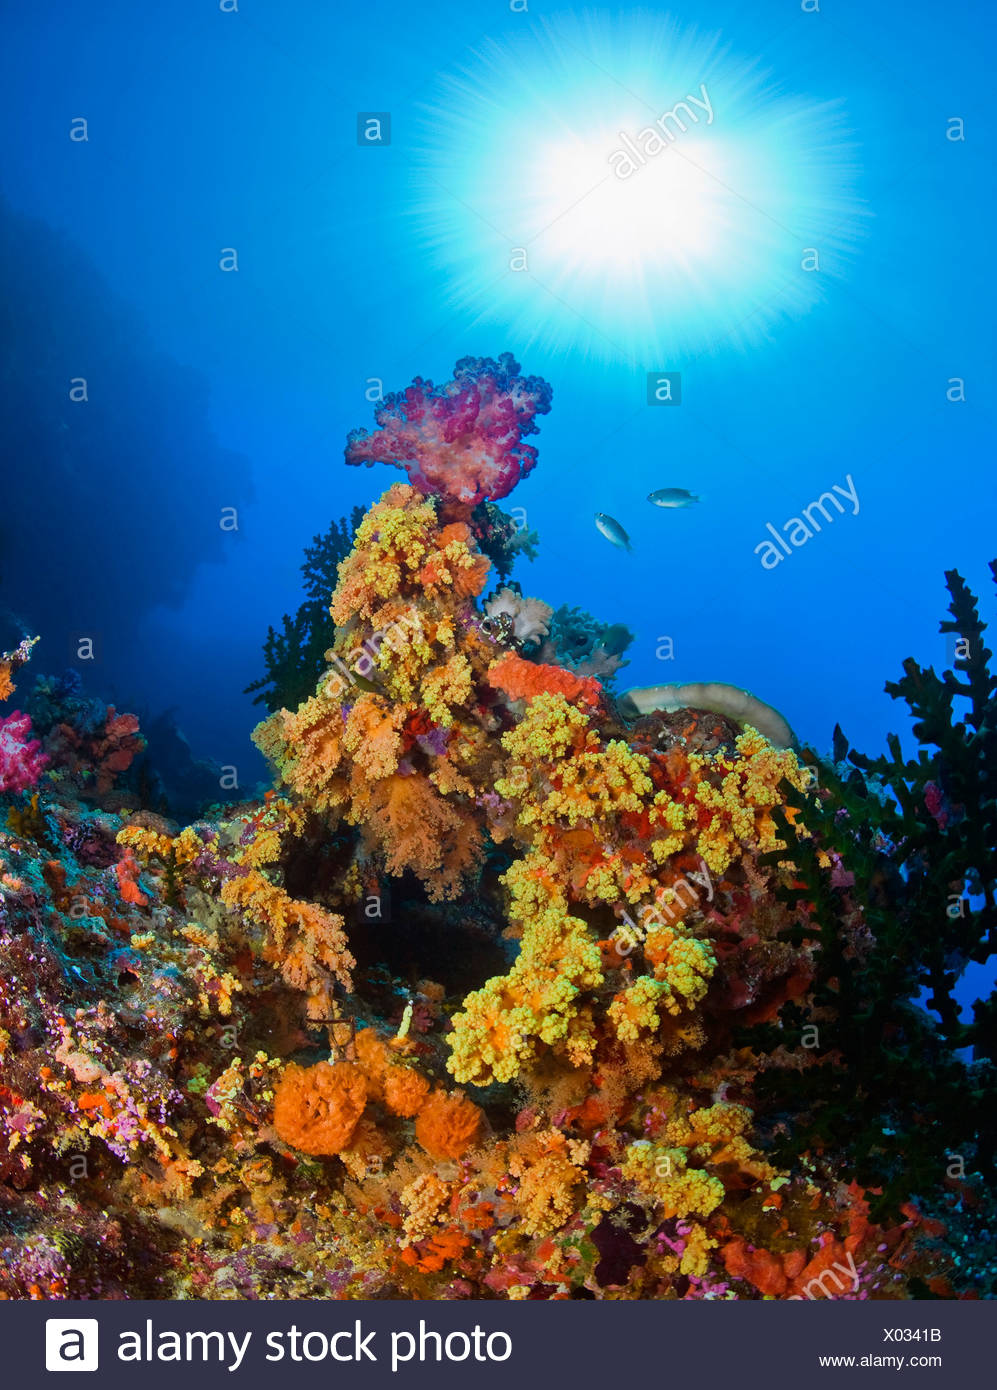 Underwater starburst streaming down on soft corals, Fiji - Stock Image